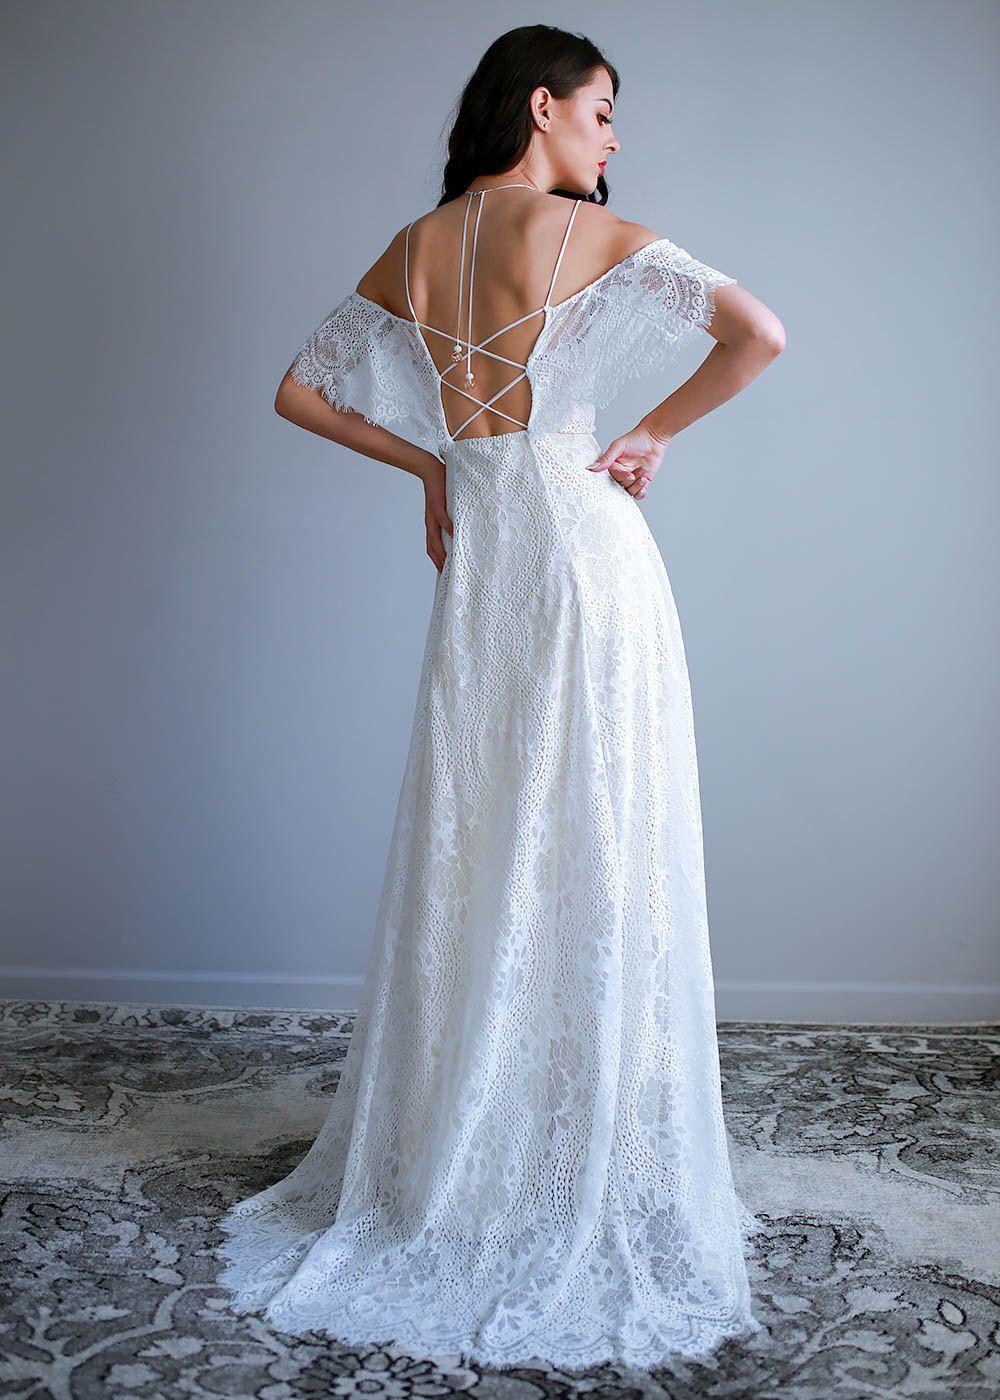 Off shoulder wedding dress boho wedding dress hippie wedding dress